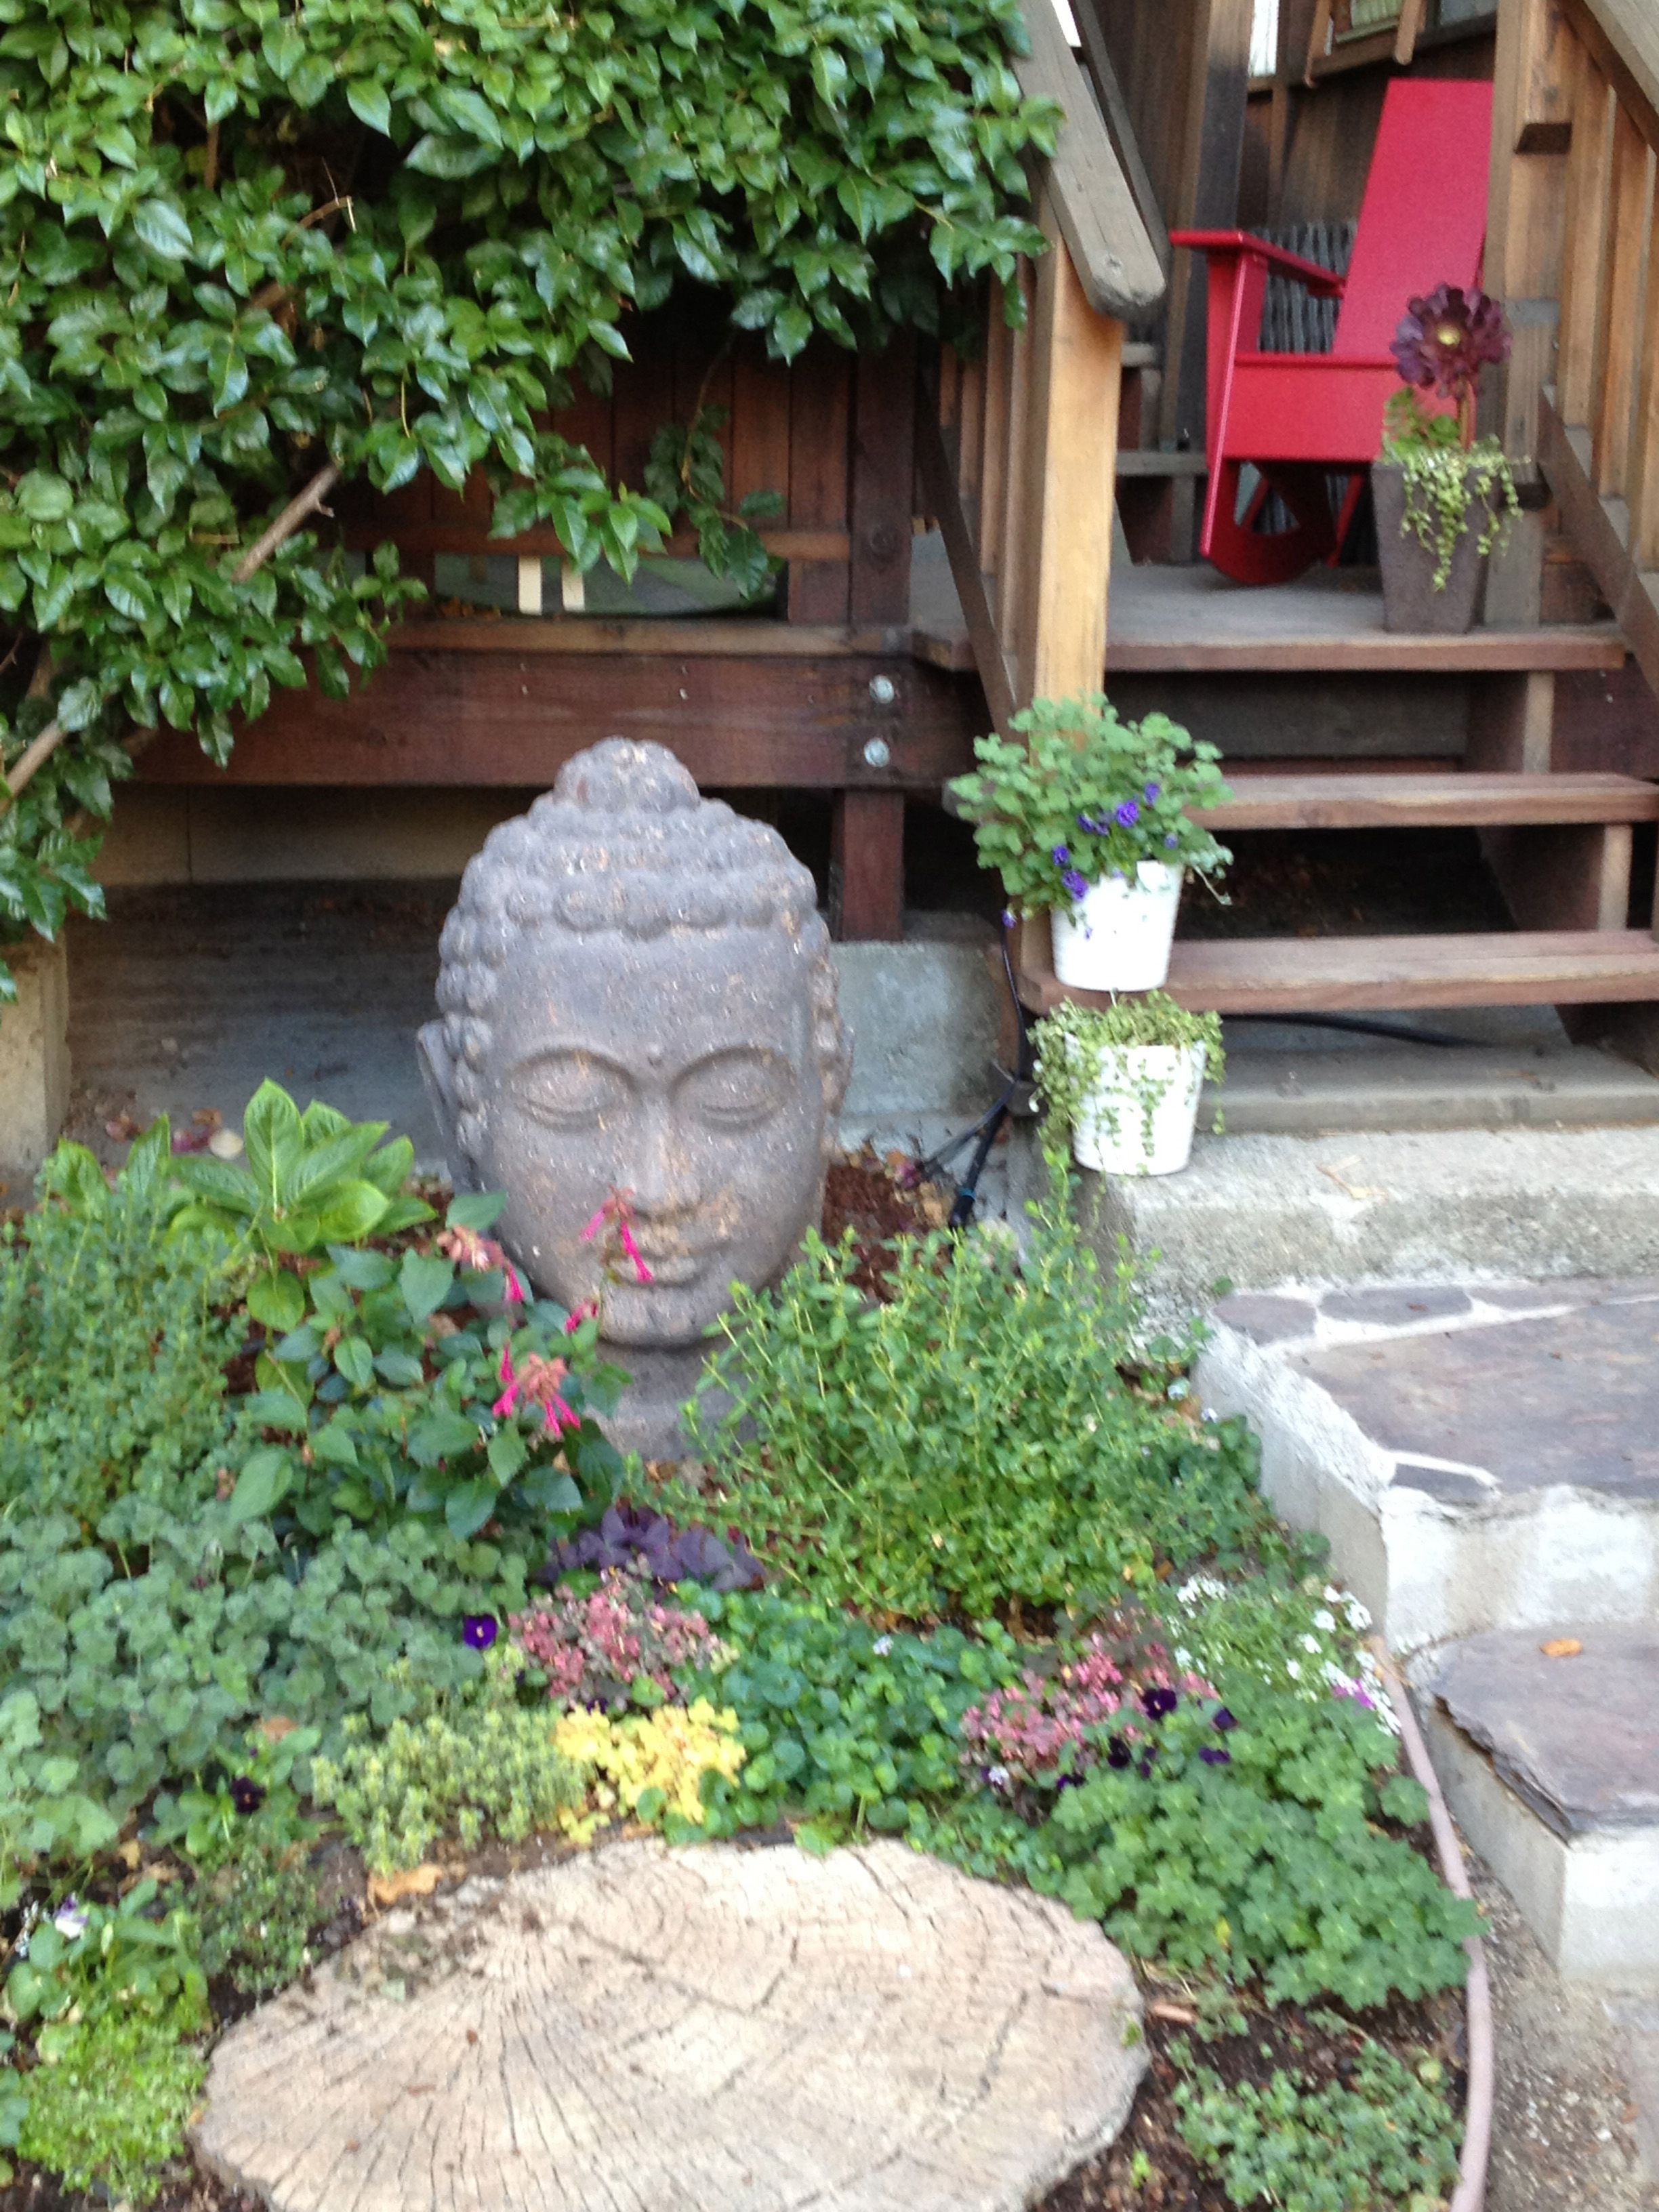 Delightful Buddha Head In The Garden